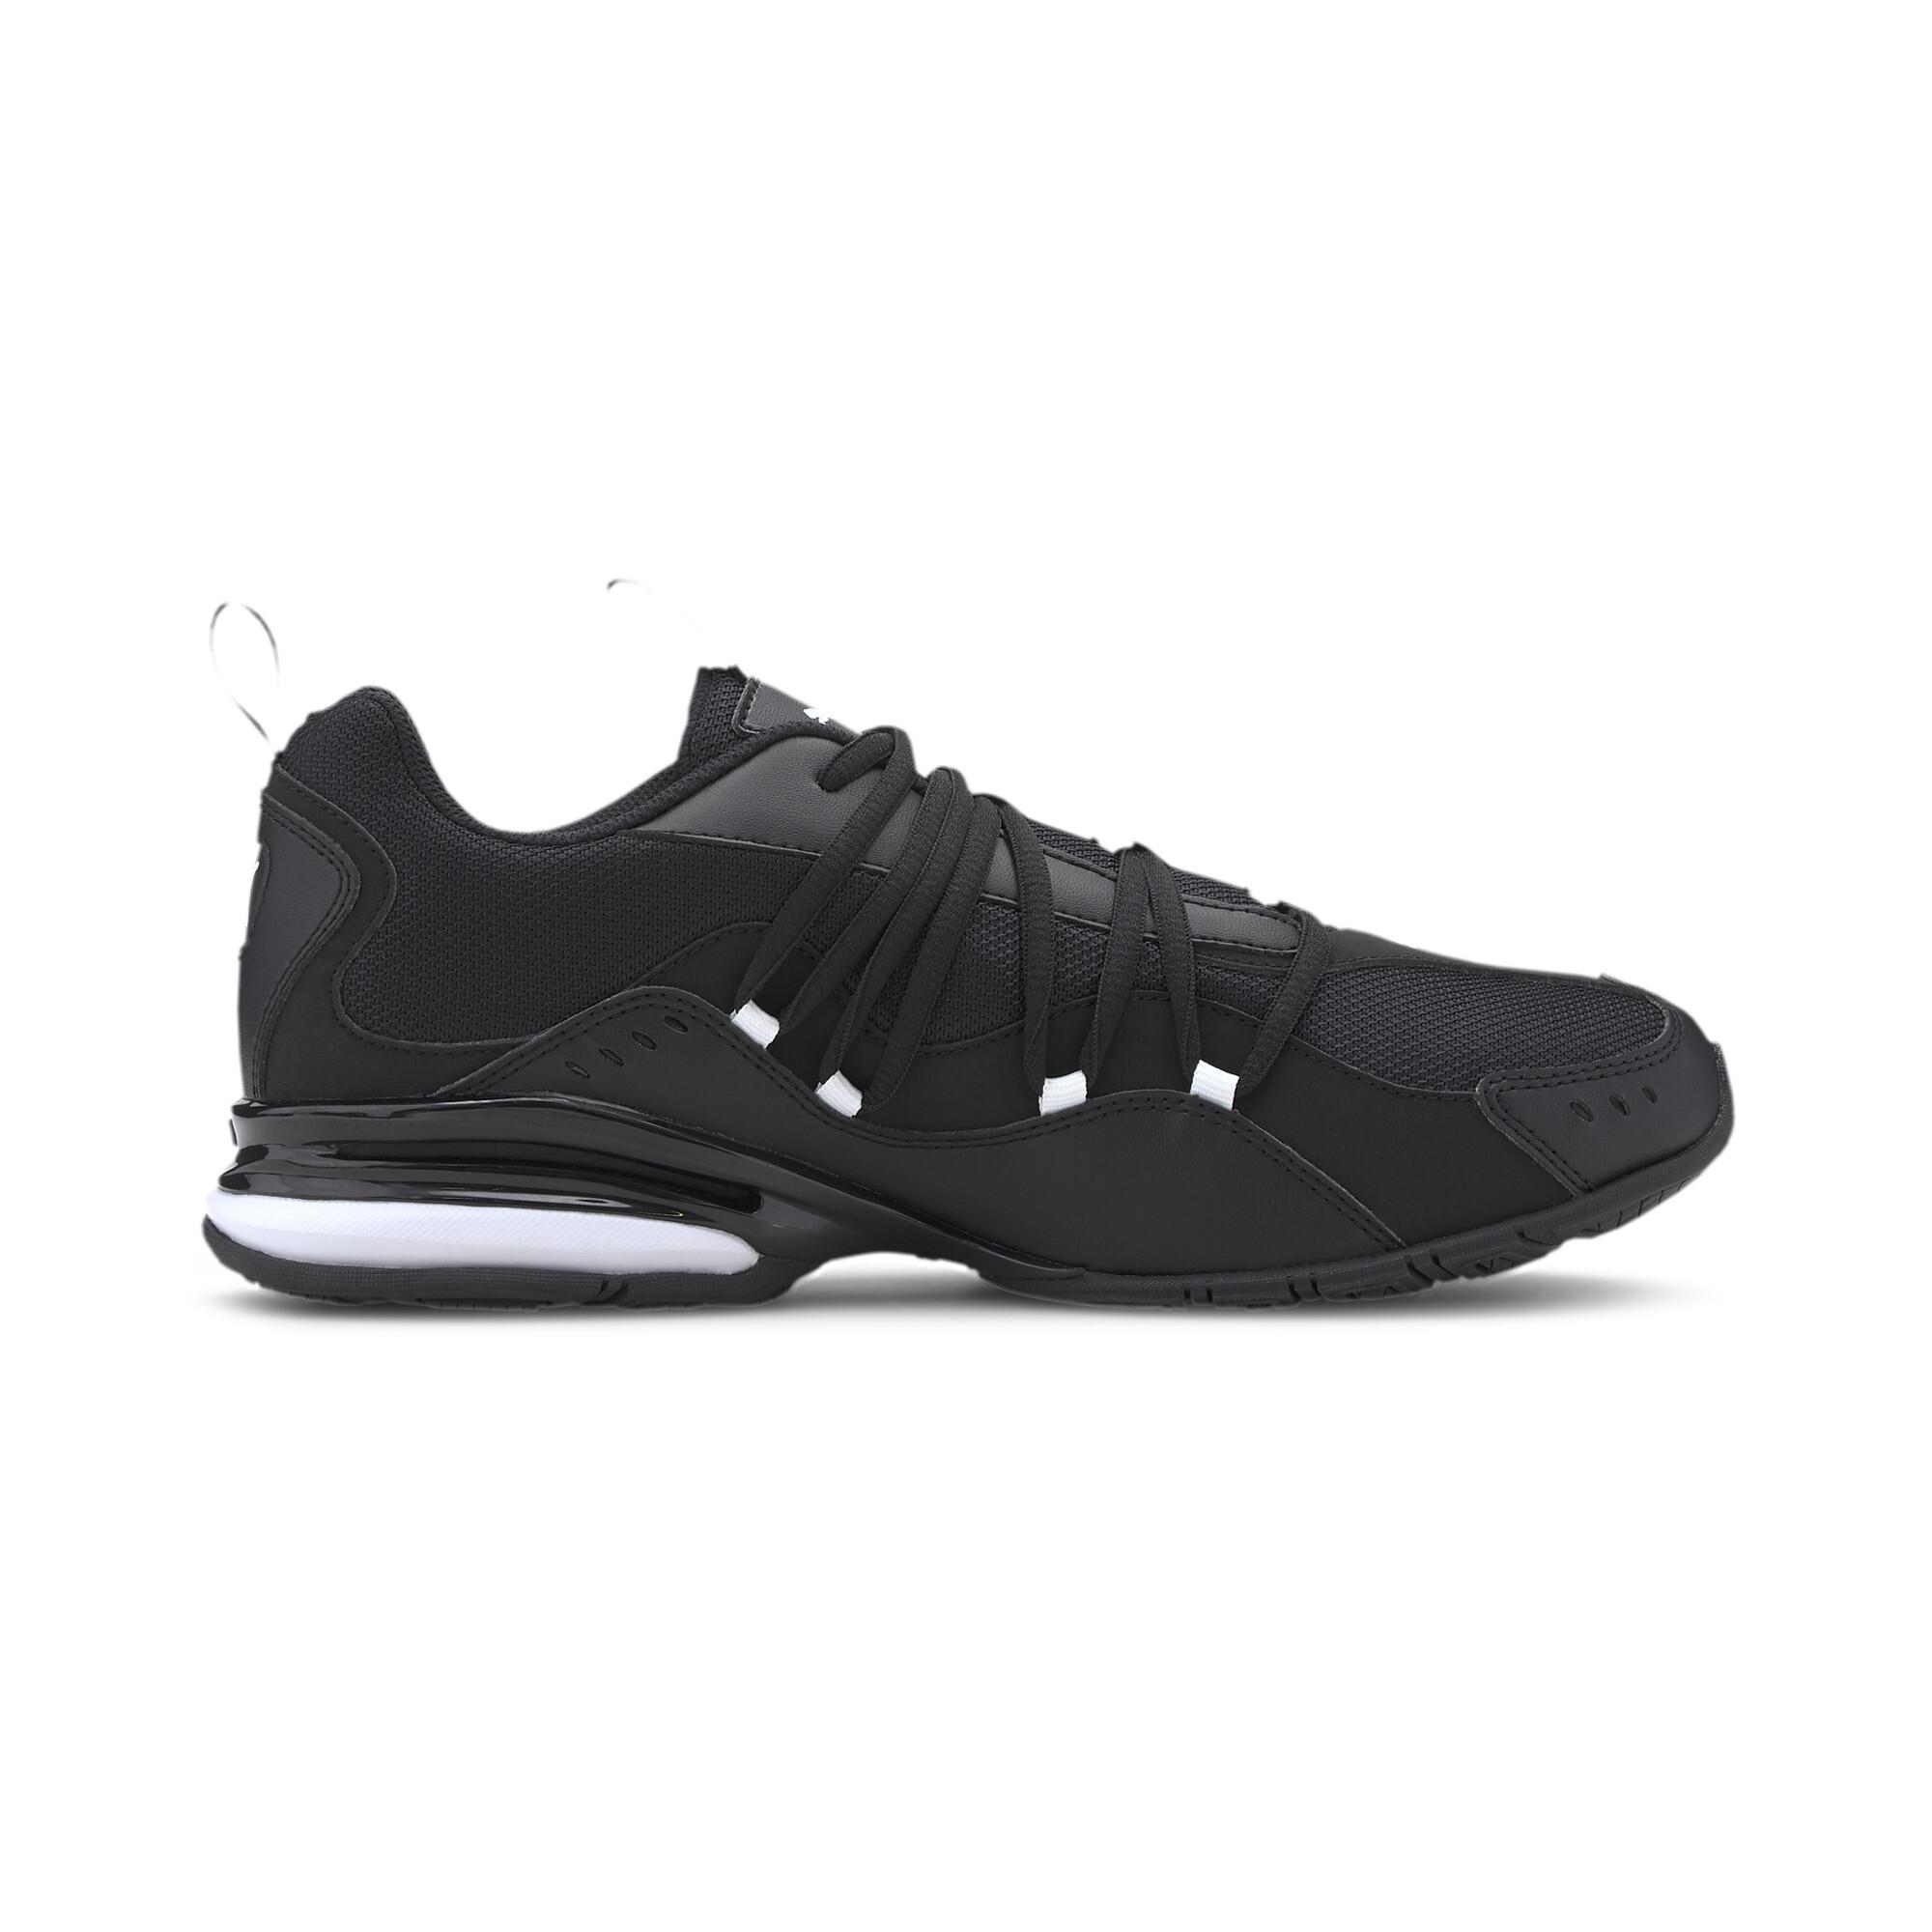 PUMA-Men-039-s-Silverion-Running-Shoes thumbnail 12